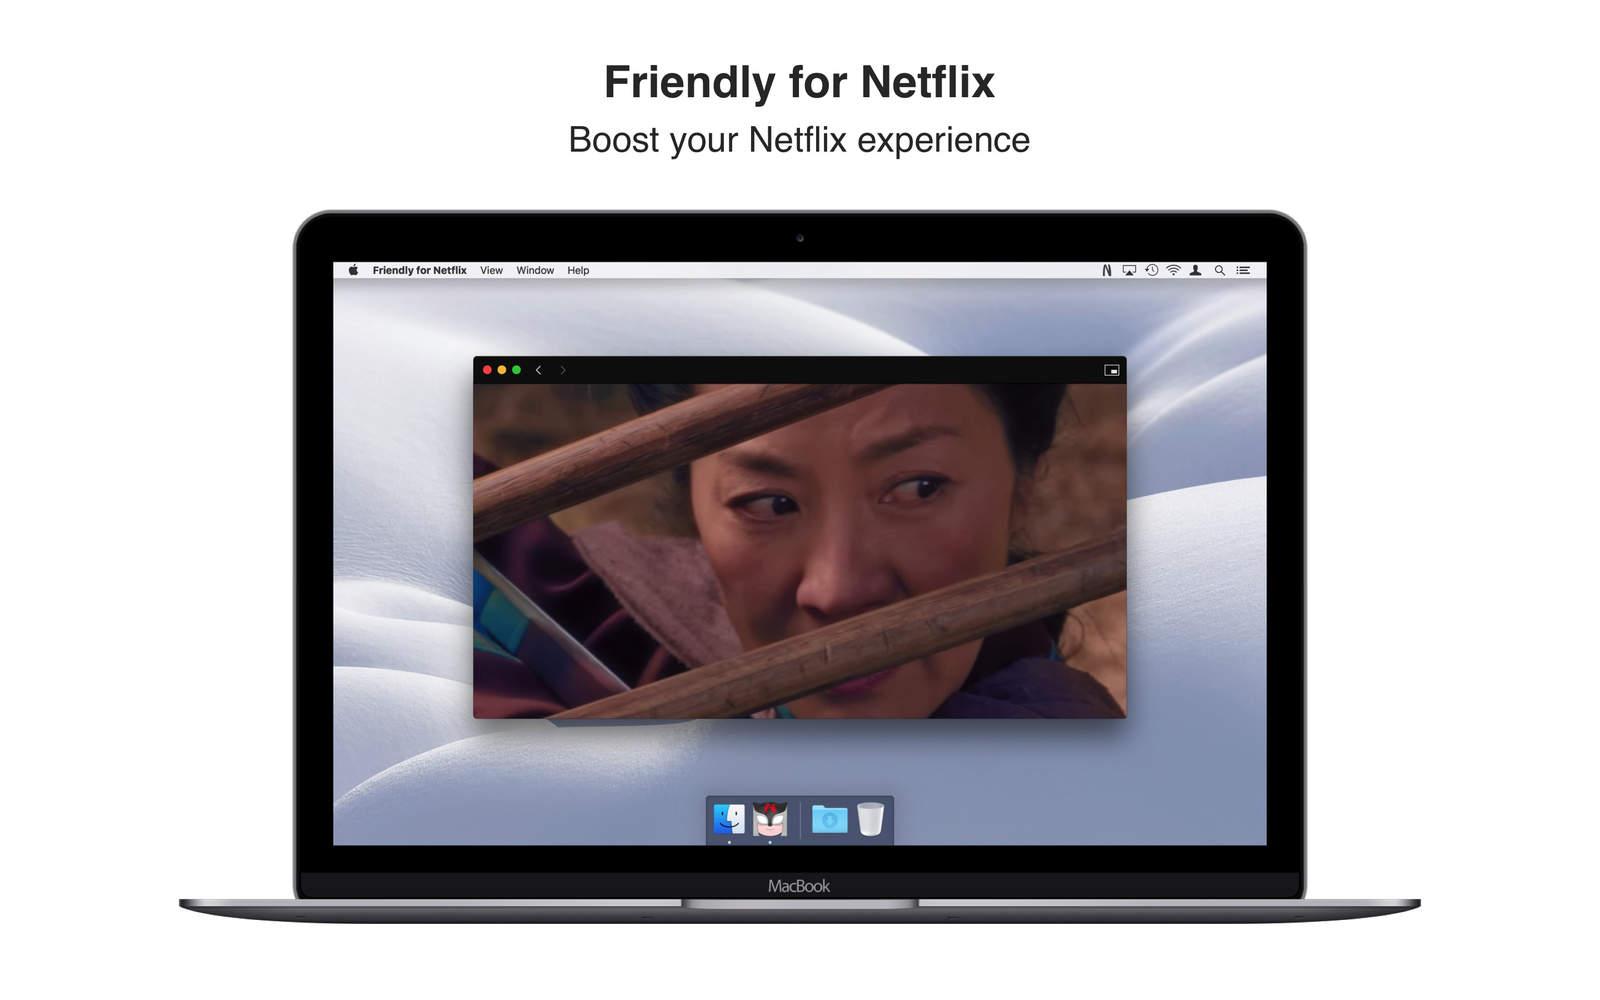 Friendly for Netflix